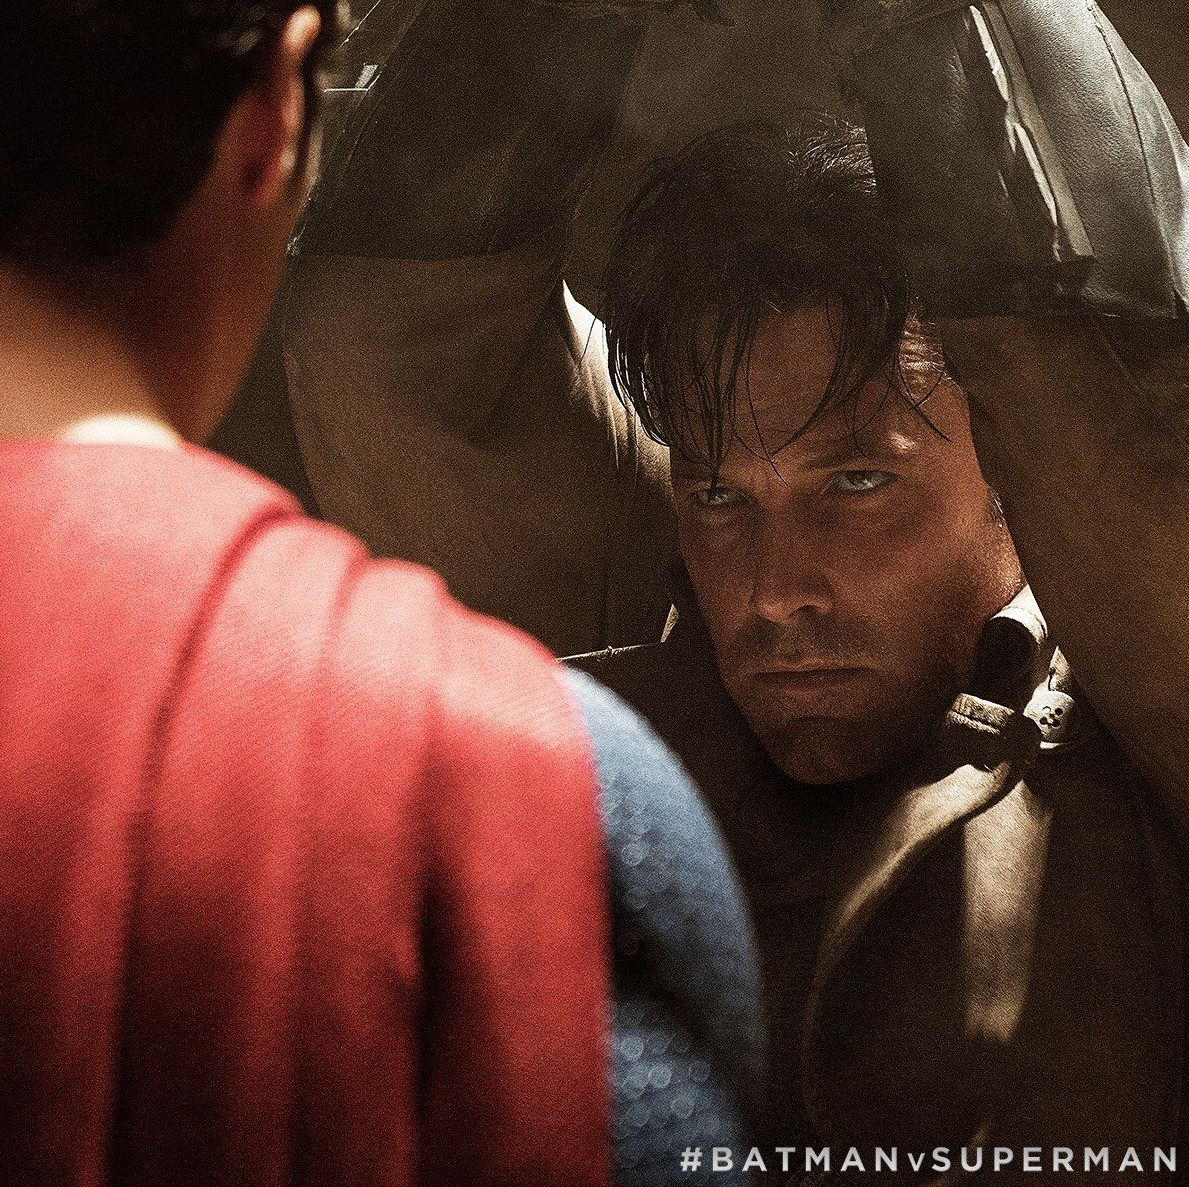 Bruce Wayne stares down Superman